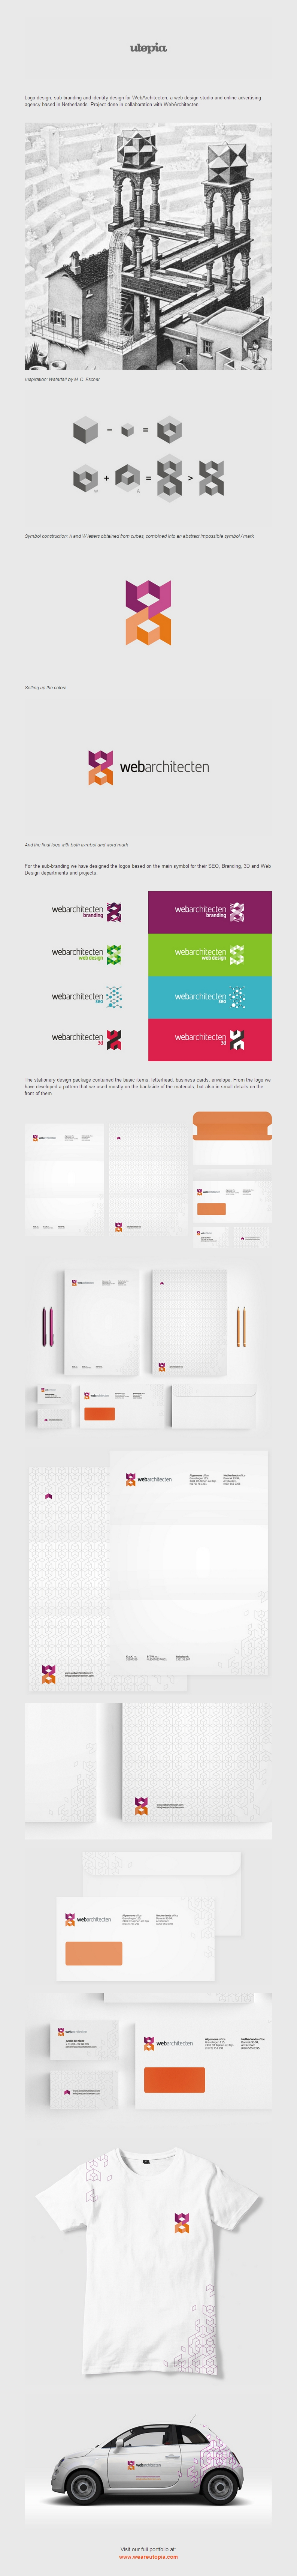 Web Architecten logo and corporate identity design by Utopia Branding Agency 2 Web Architecten logo and corporate identity design by Utopia Branding Agency